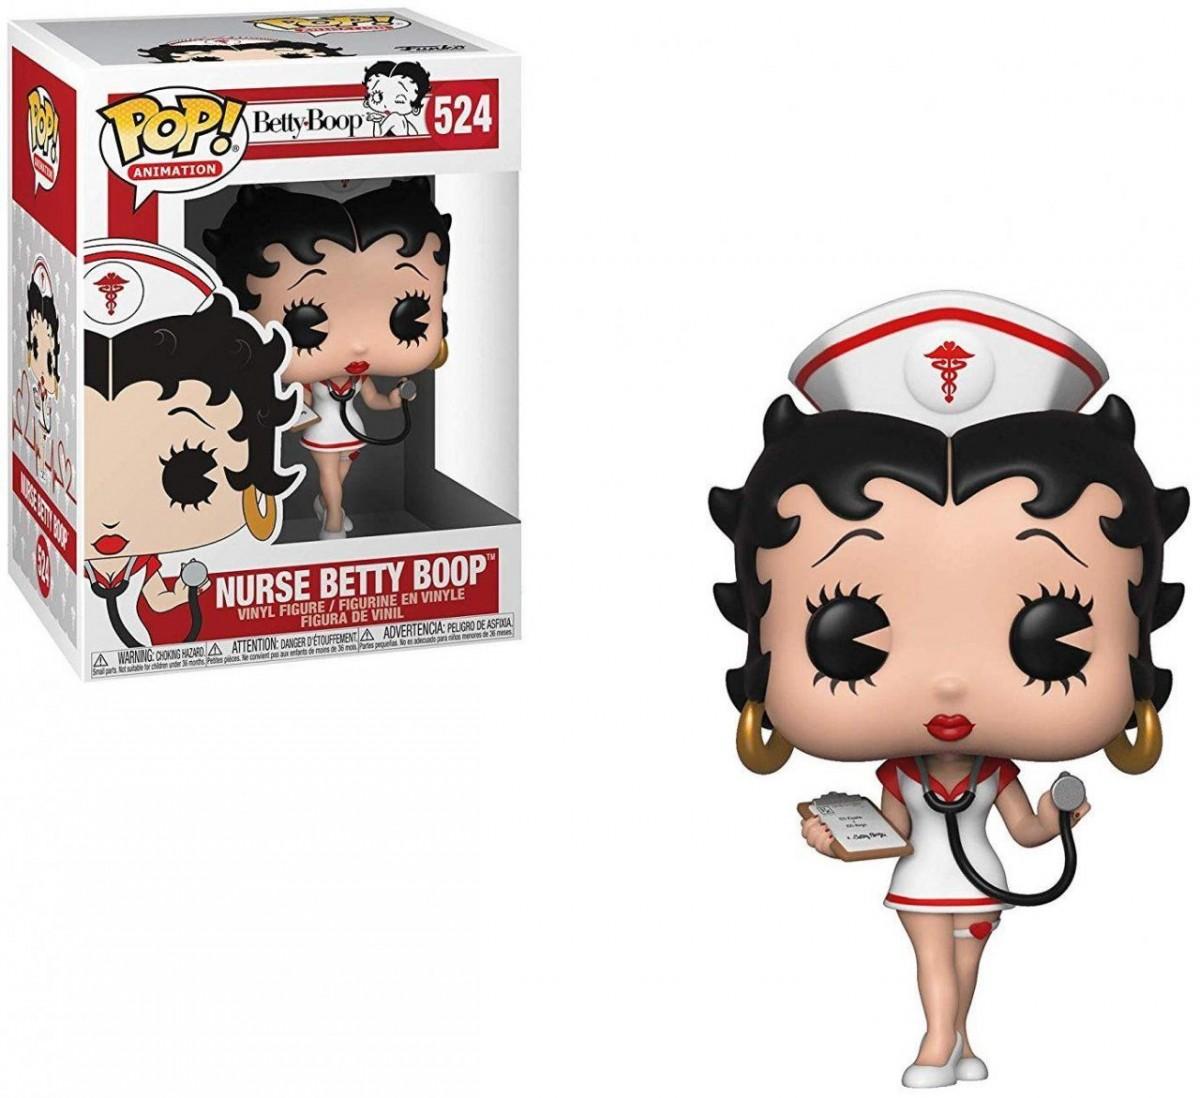 Фигурка Funko POP! Vinyl: Бетти Буп медсестра (Nurse) Бетти Буп (Betty Boop) (35589) 9,5 см